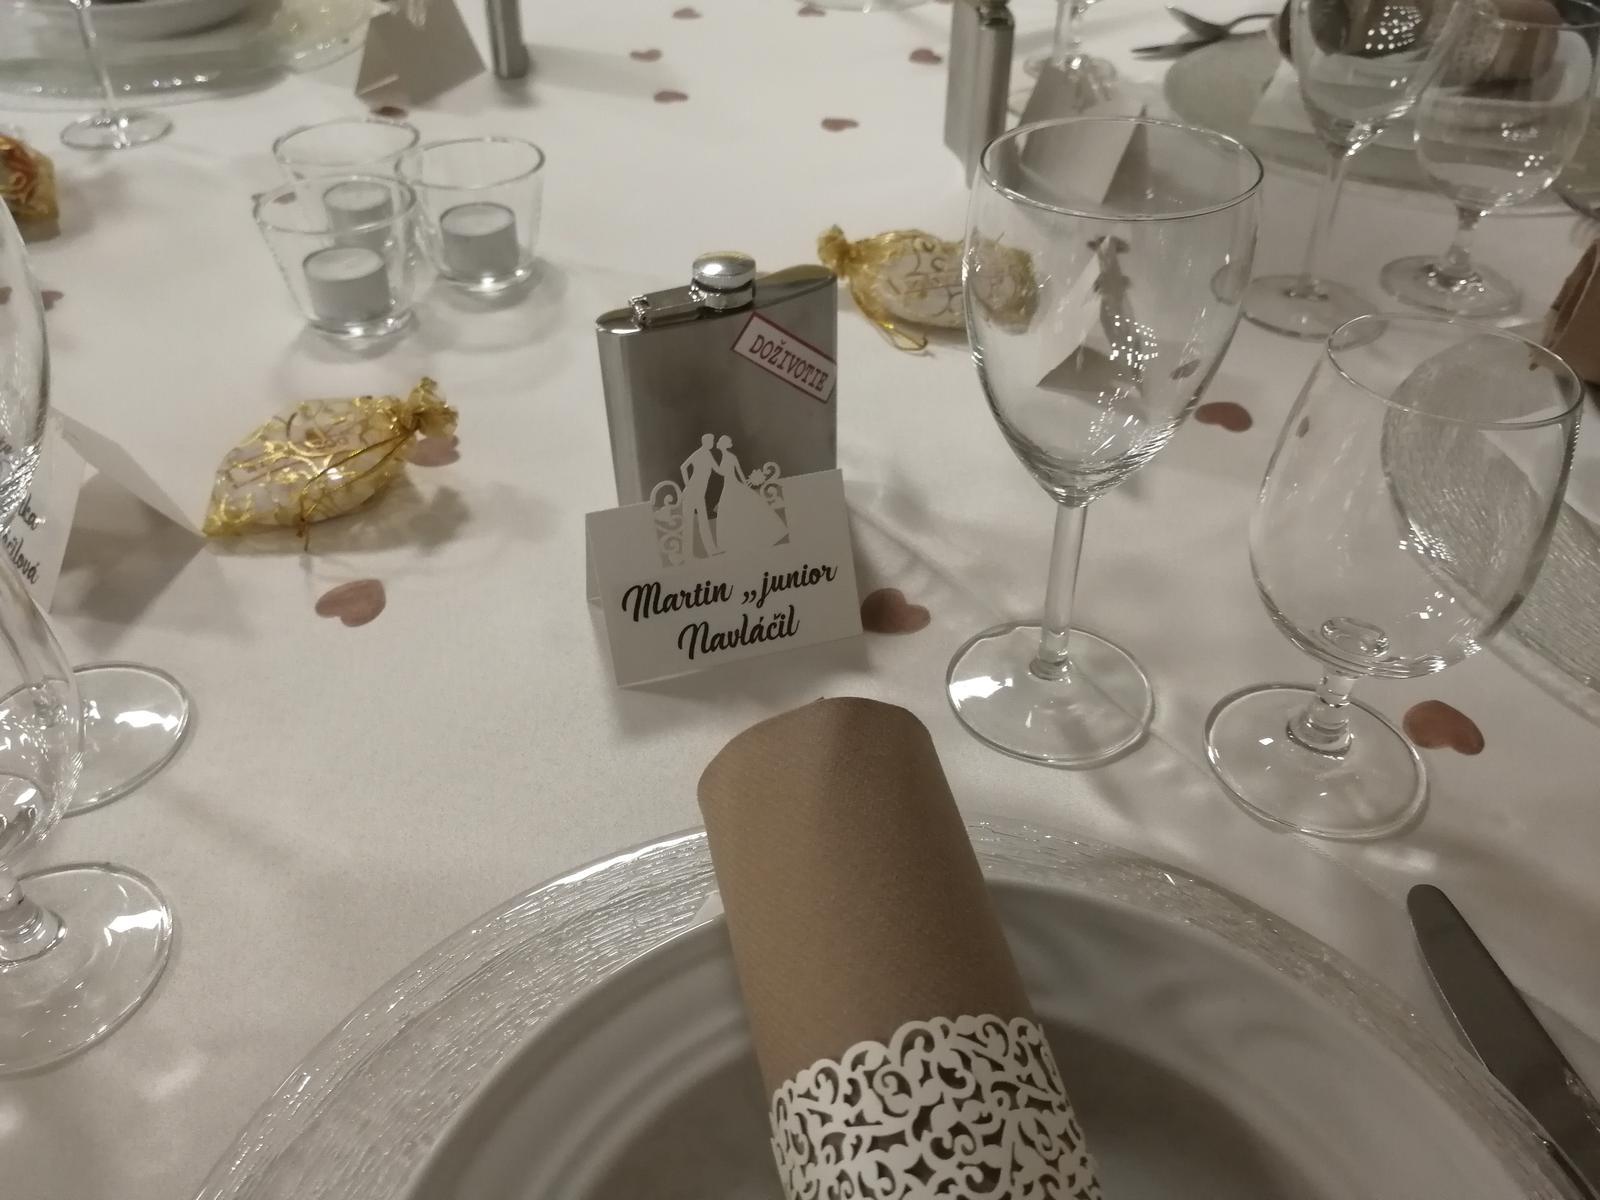 Svadba 7.4.2018 Zvolen Hotel TENIS - Obrázok č. 20